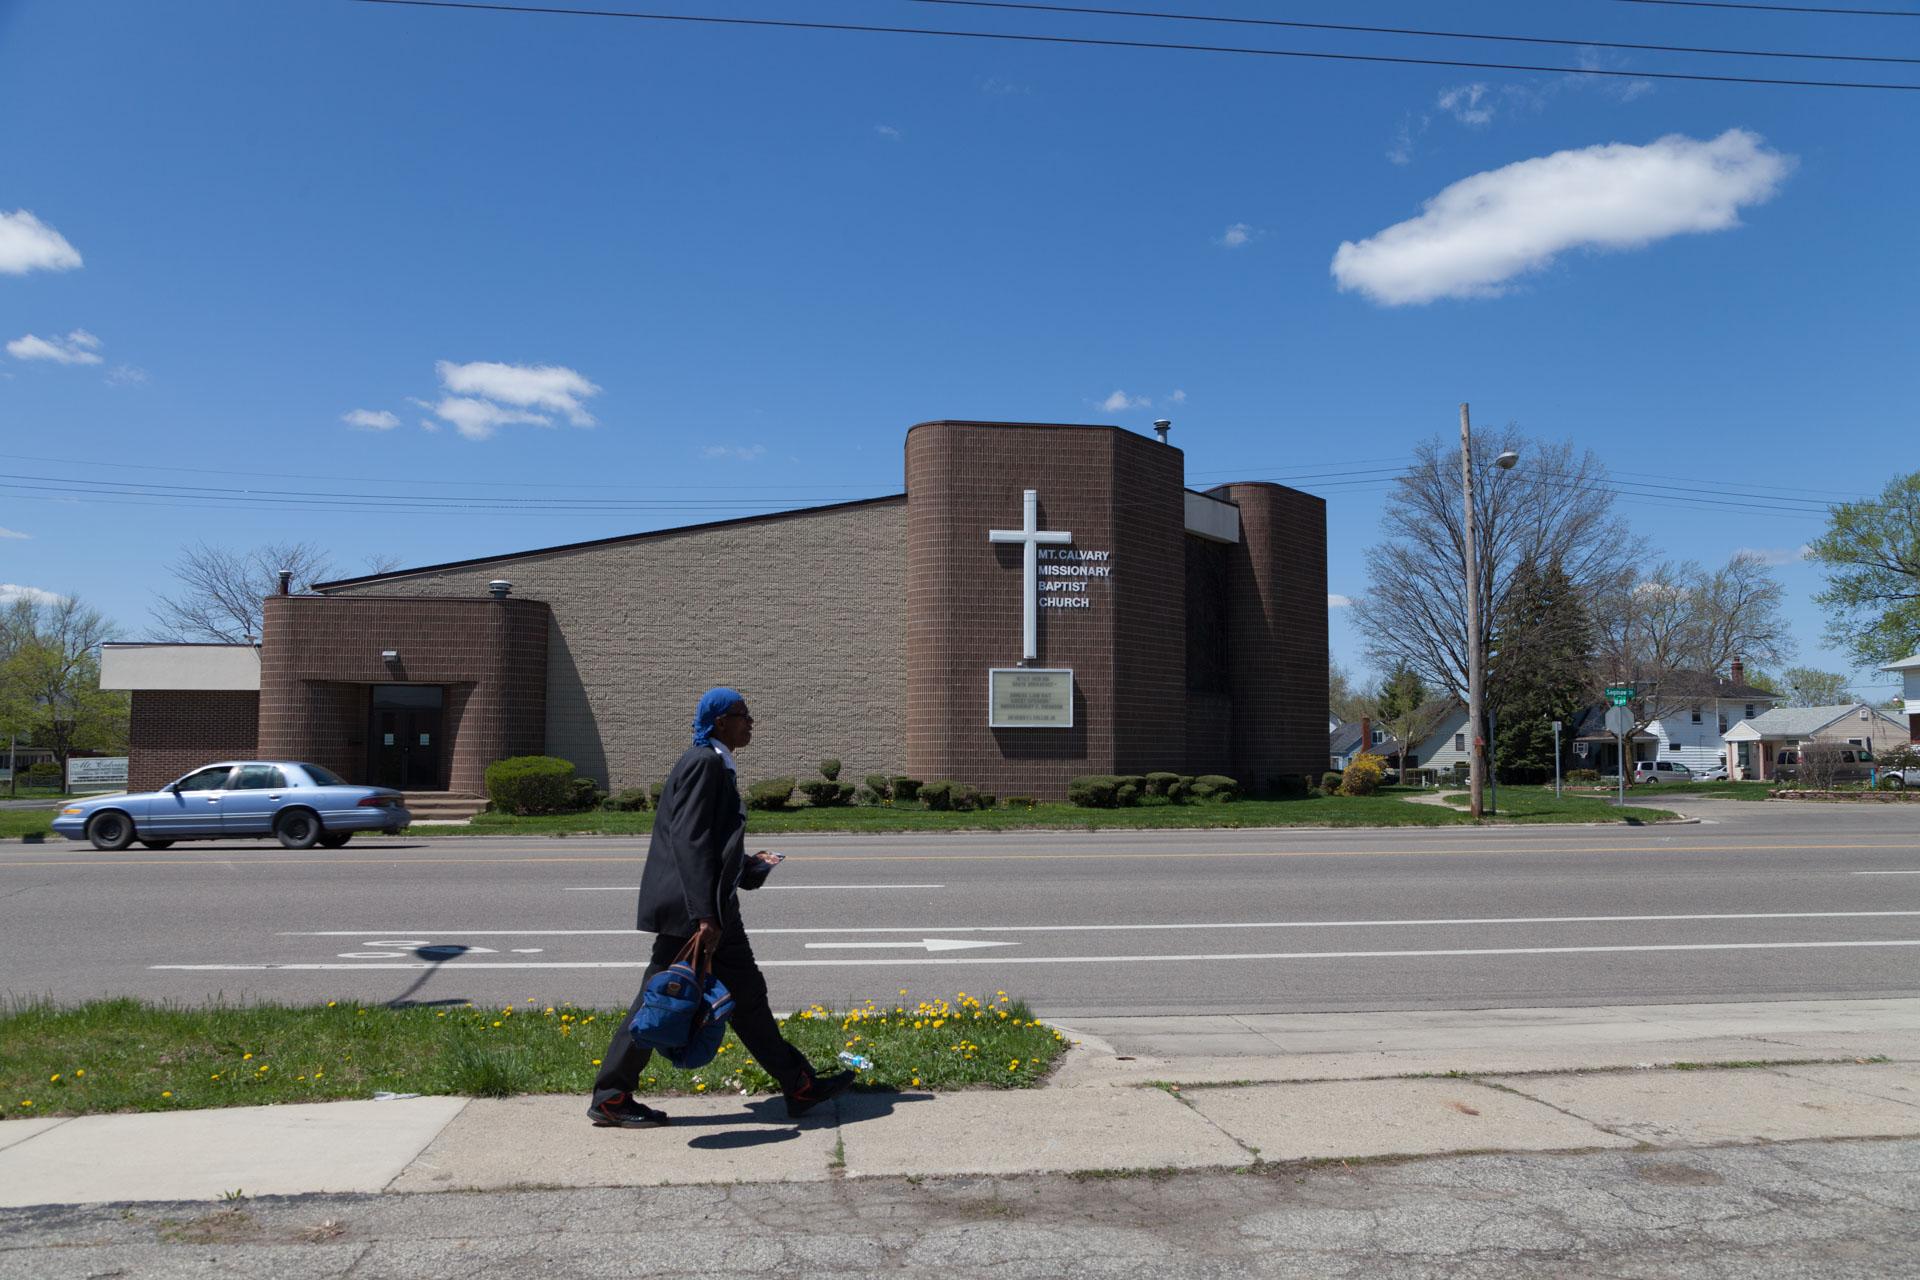 4805 N. Saginaw St., Mt. Calvary Missionary Baptist Church